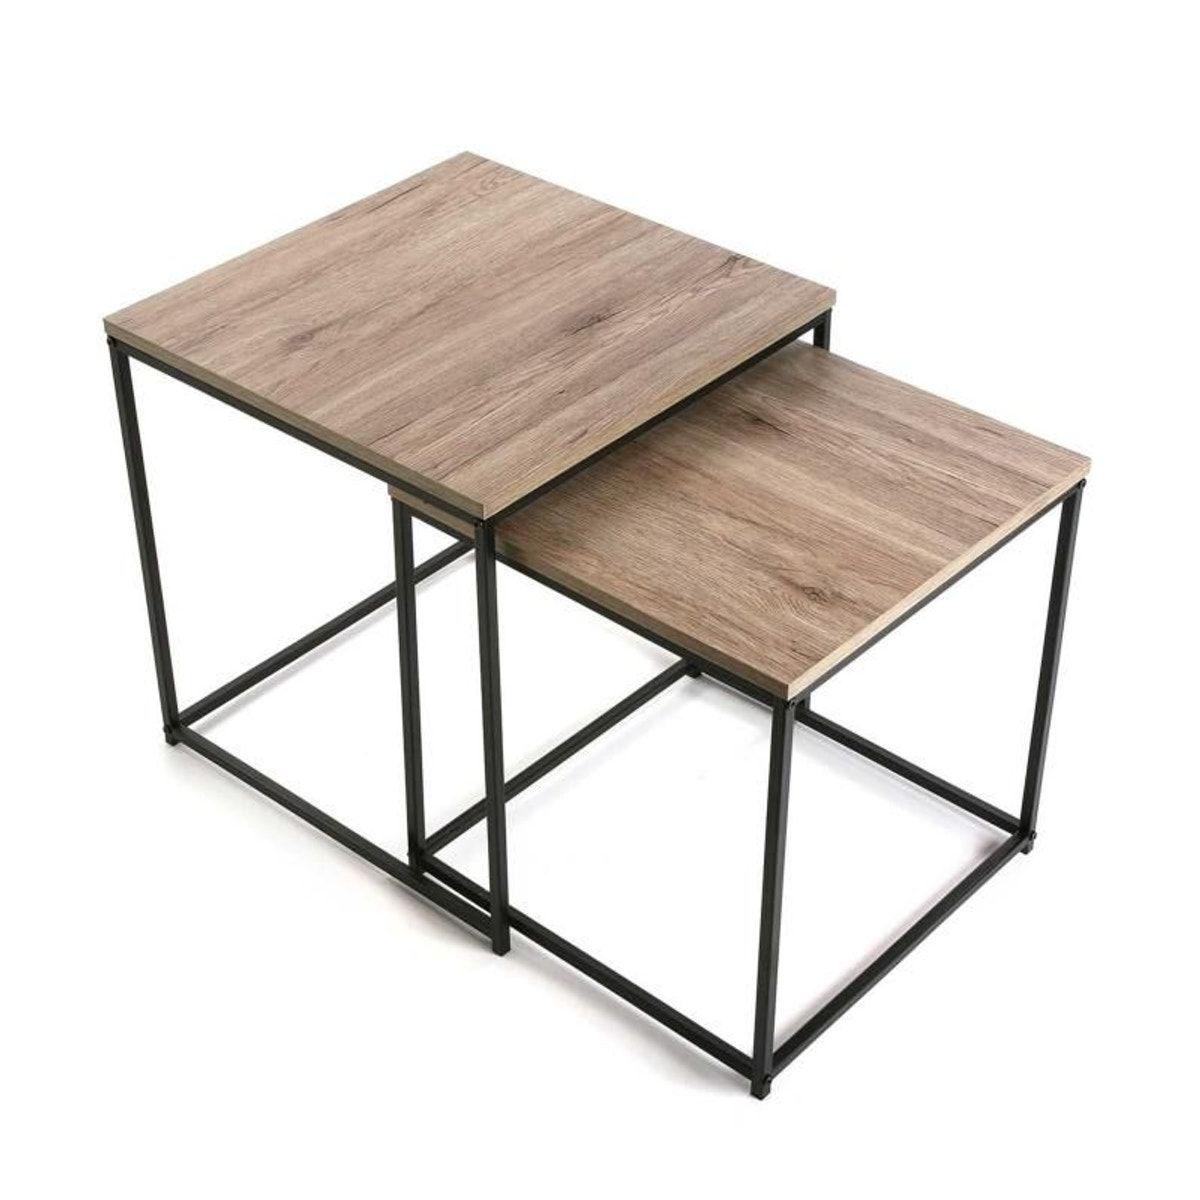 Set 2 Tables Basses Ajustables Taille Taille Unique Table